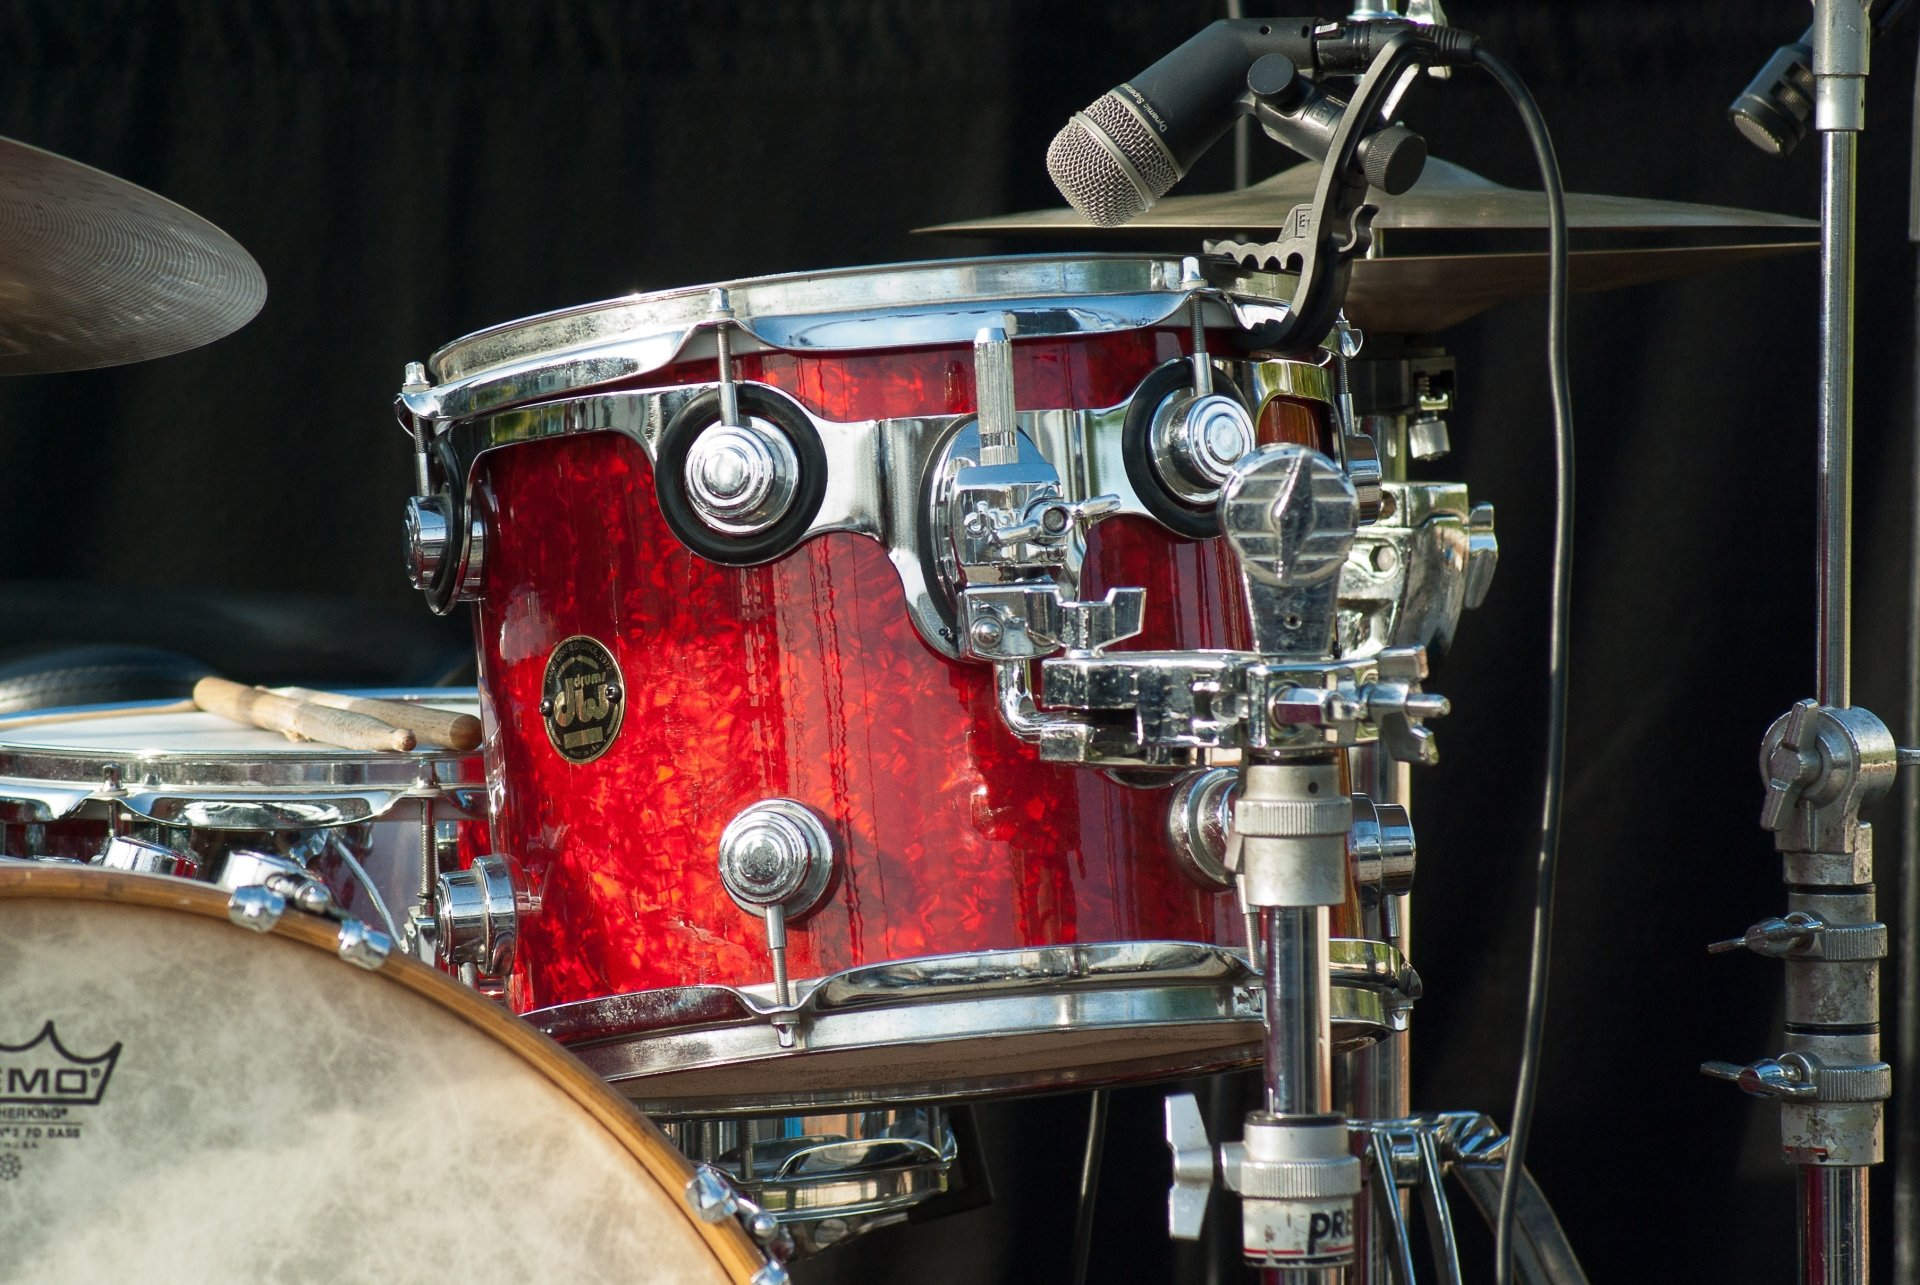 Musik - Drums  Drumset Instrument Musik Microphone Cymbal Bakgrund